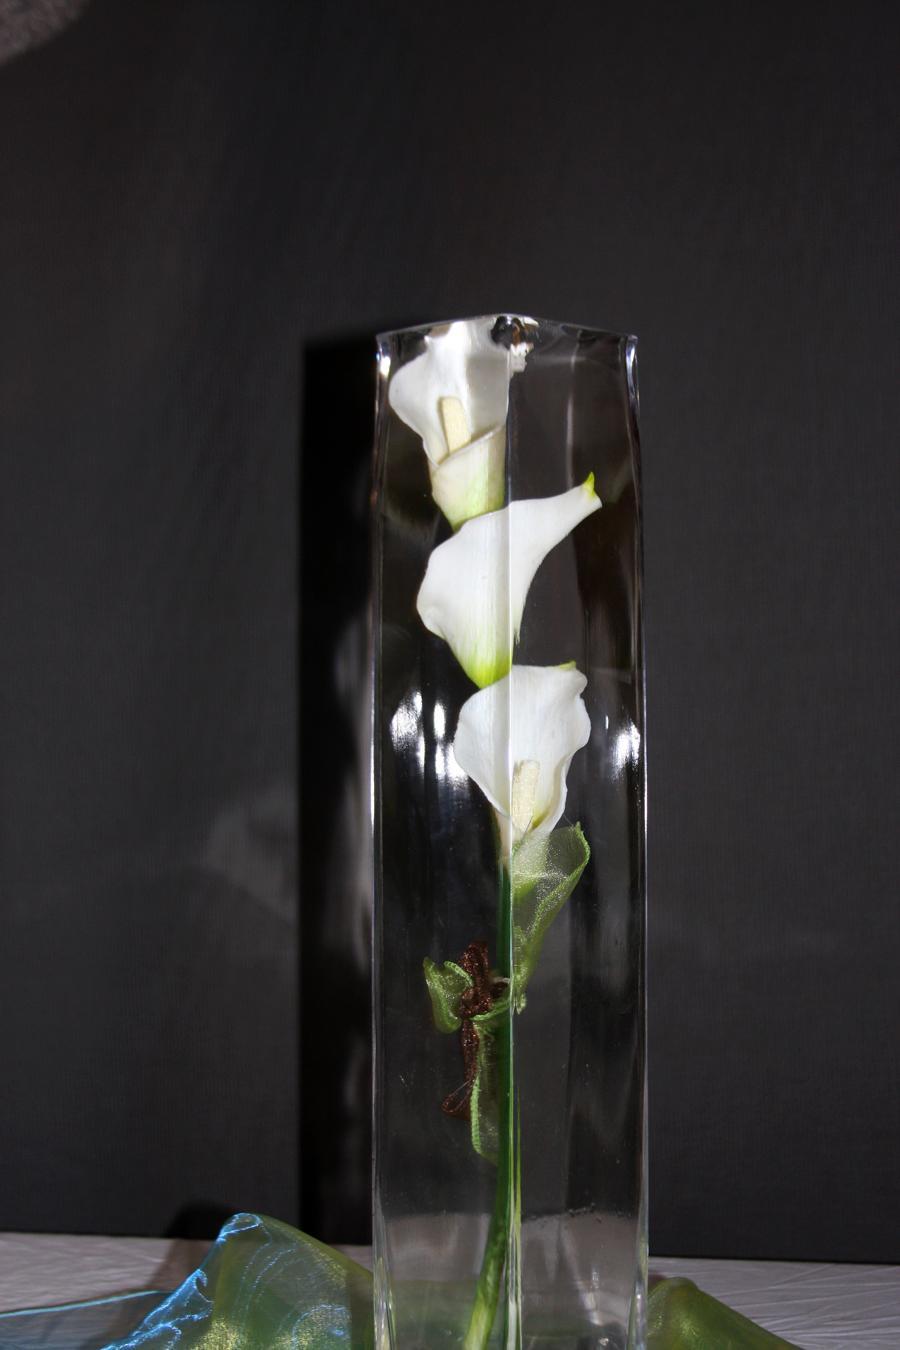 Three calla lilies were tied